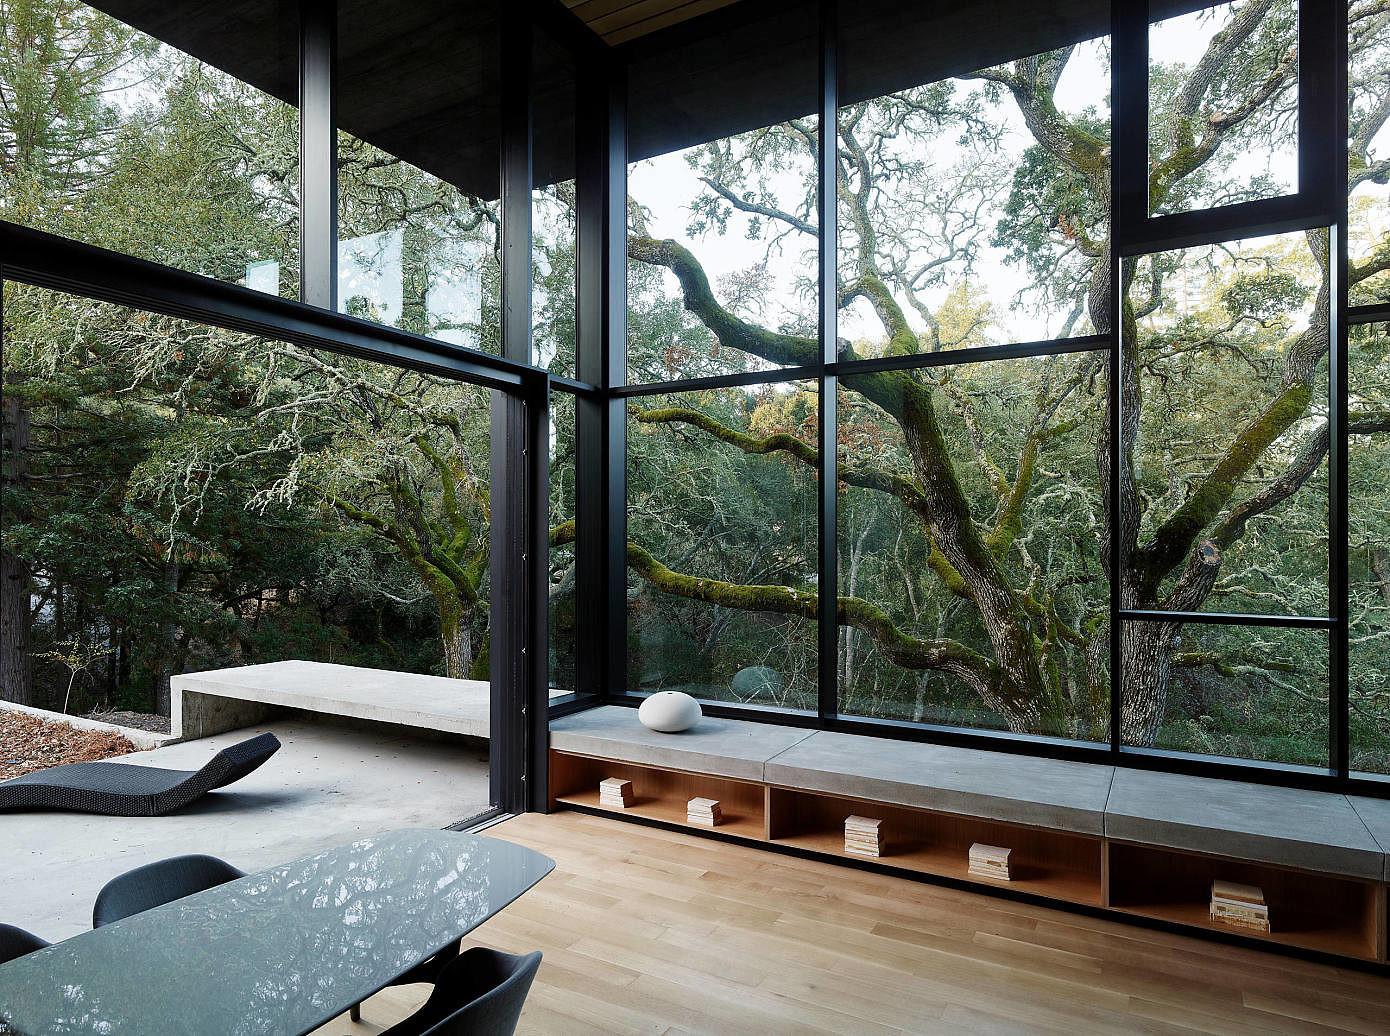 Treeside Residence by Faulkner Architects